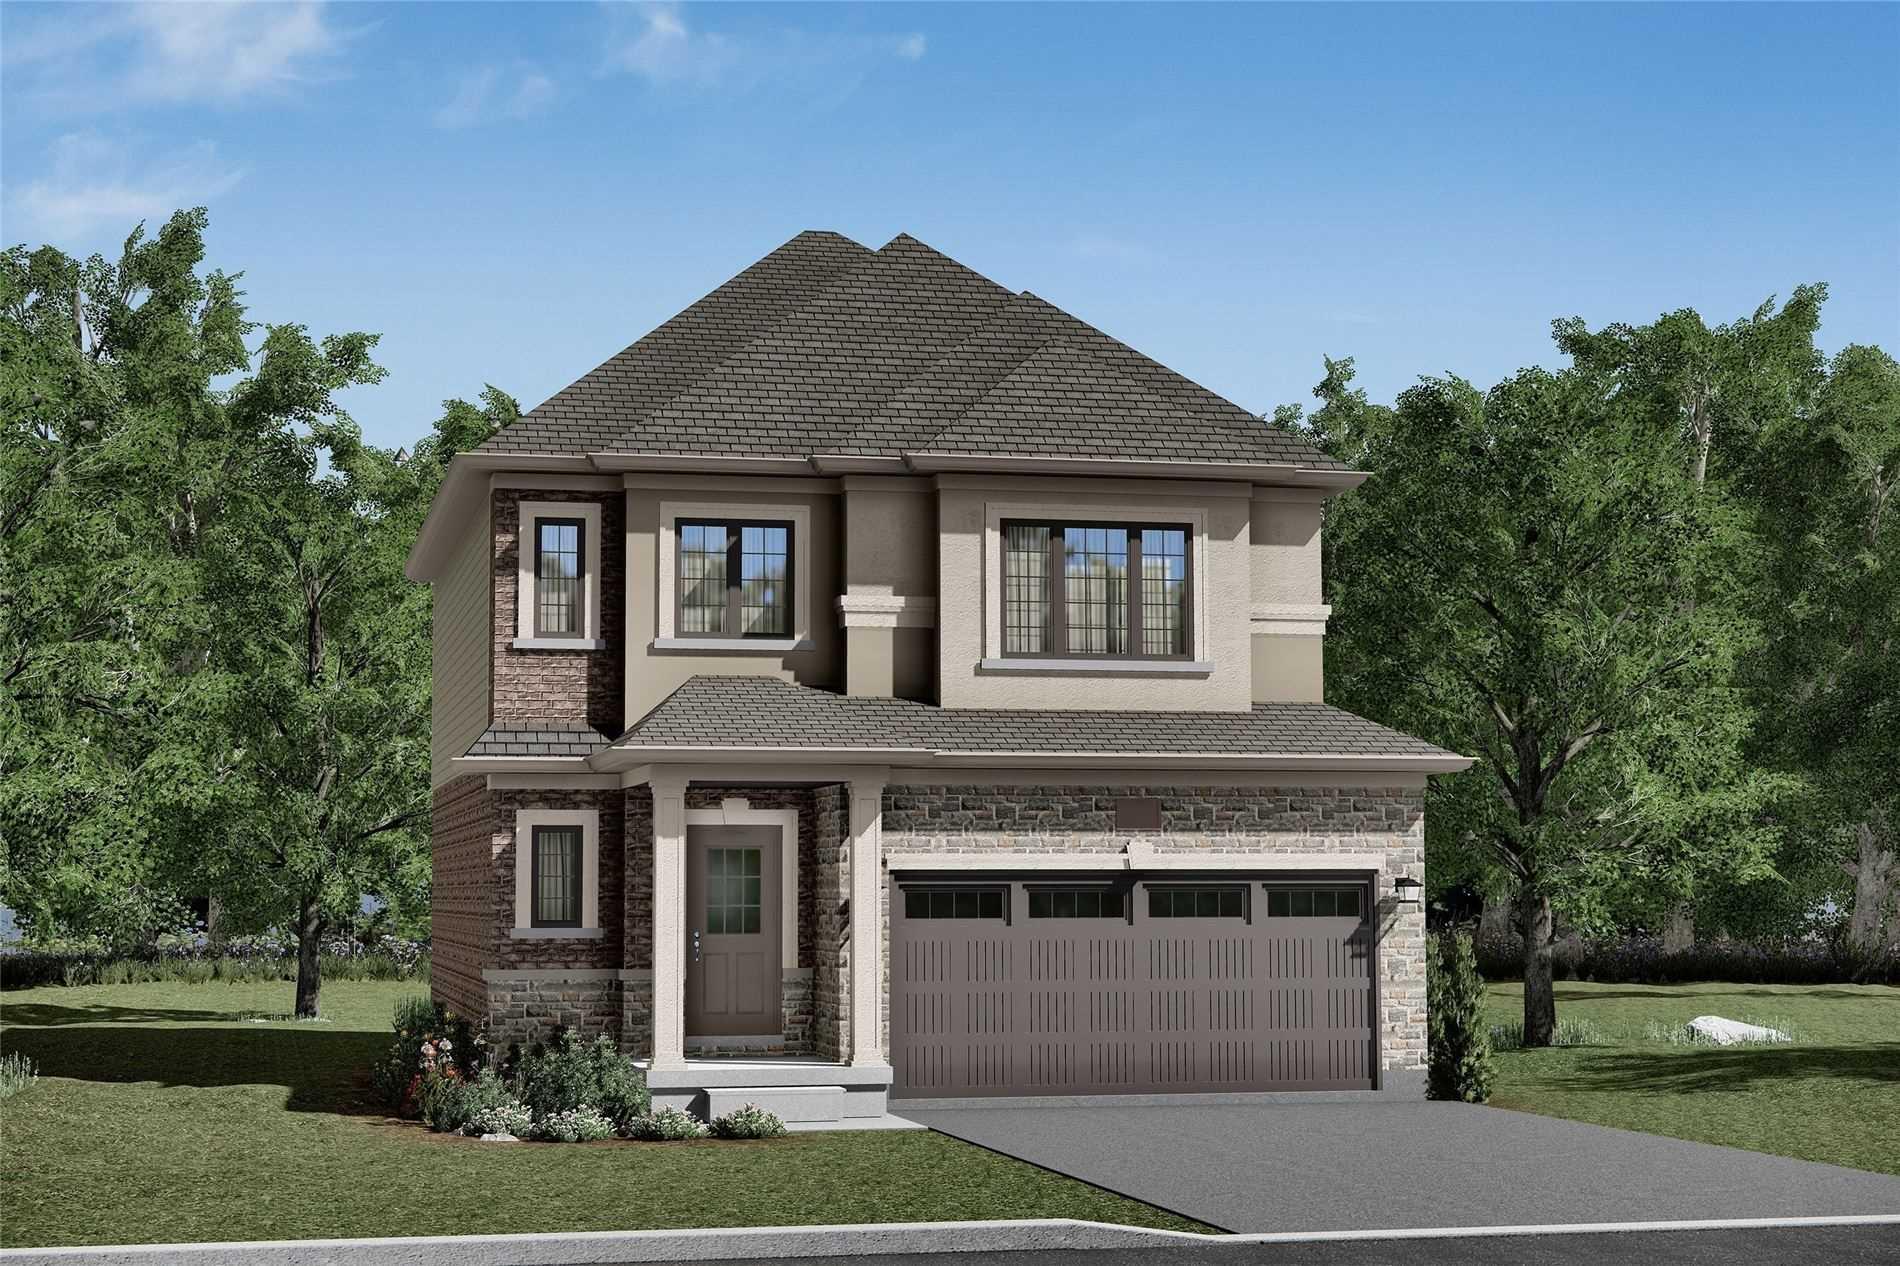 Lot 56 Street E St, Brantford, Ontario N3T 5L8, 3 Bedrooms Bedrooms, 7 Rooms Rooms,3 BathroomsBathrooms,Detached,For Sale,Street E,X5093865